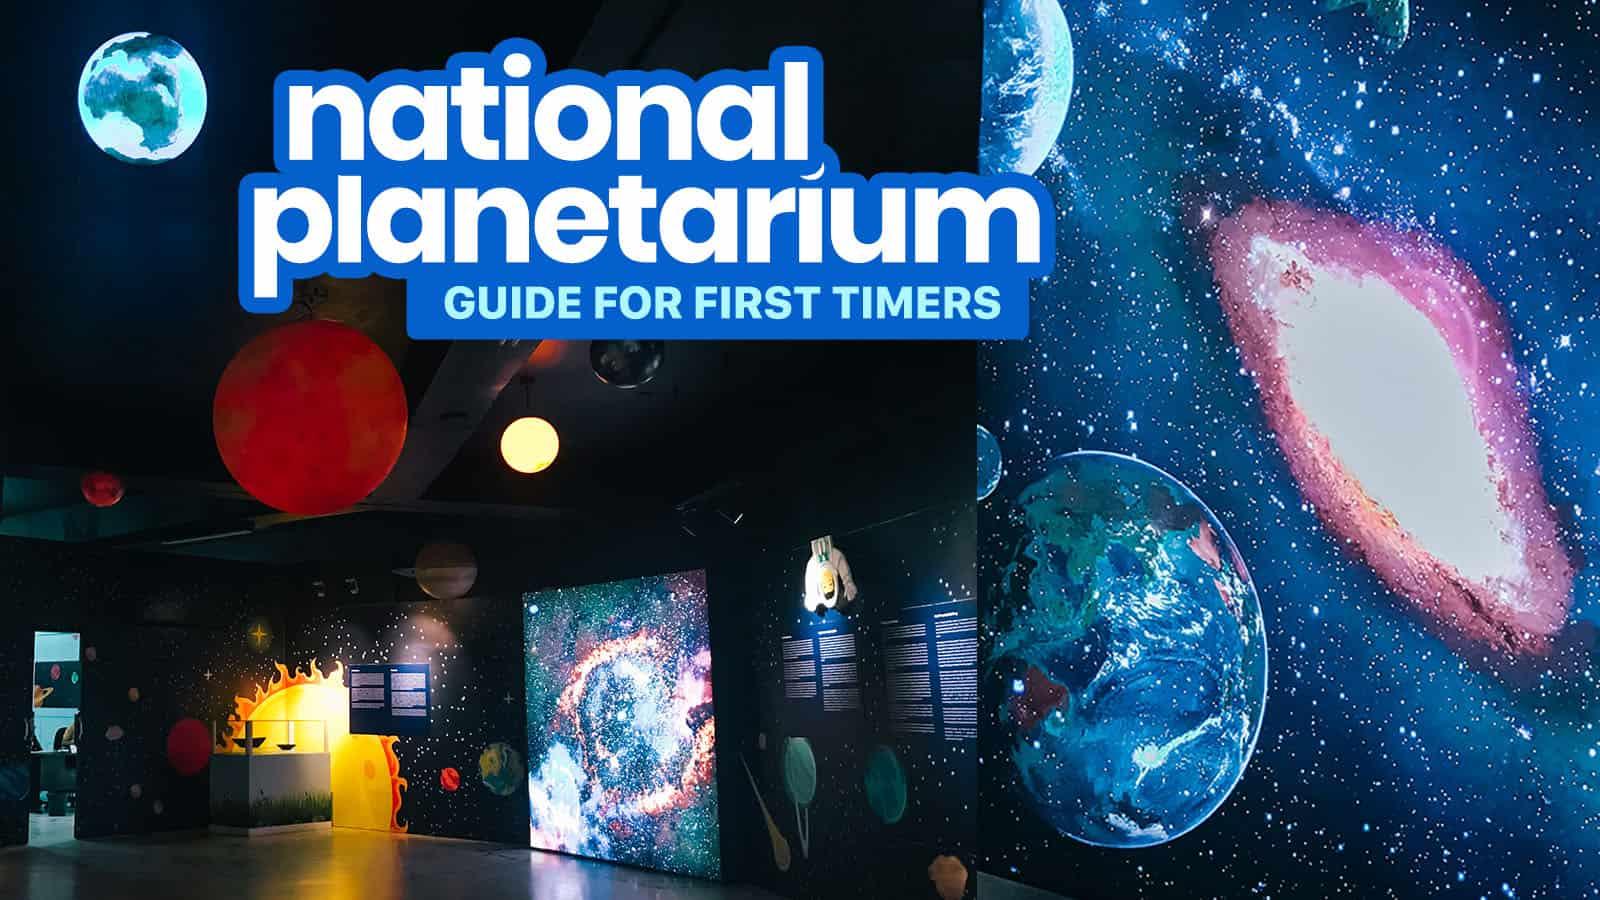 NATIONAL PLANETARIUM MANILA: Entrance Fee, Schedule & Other Tips